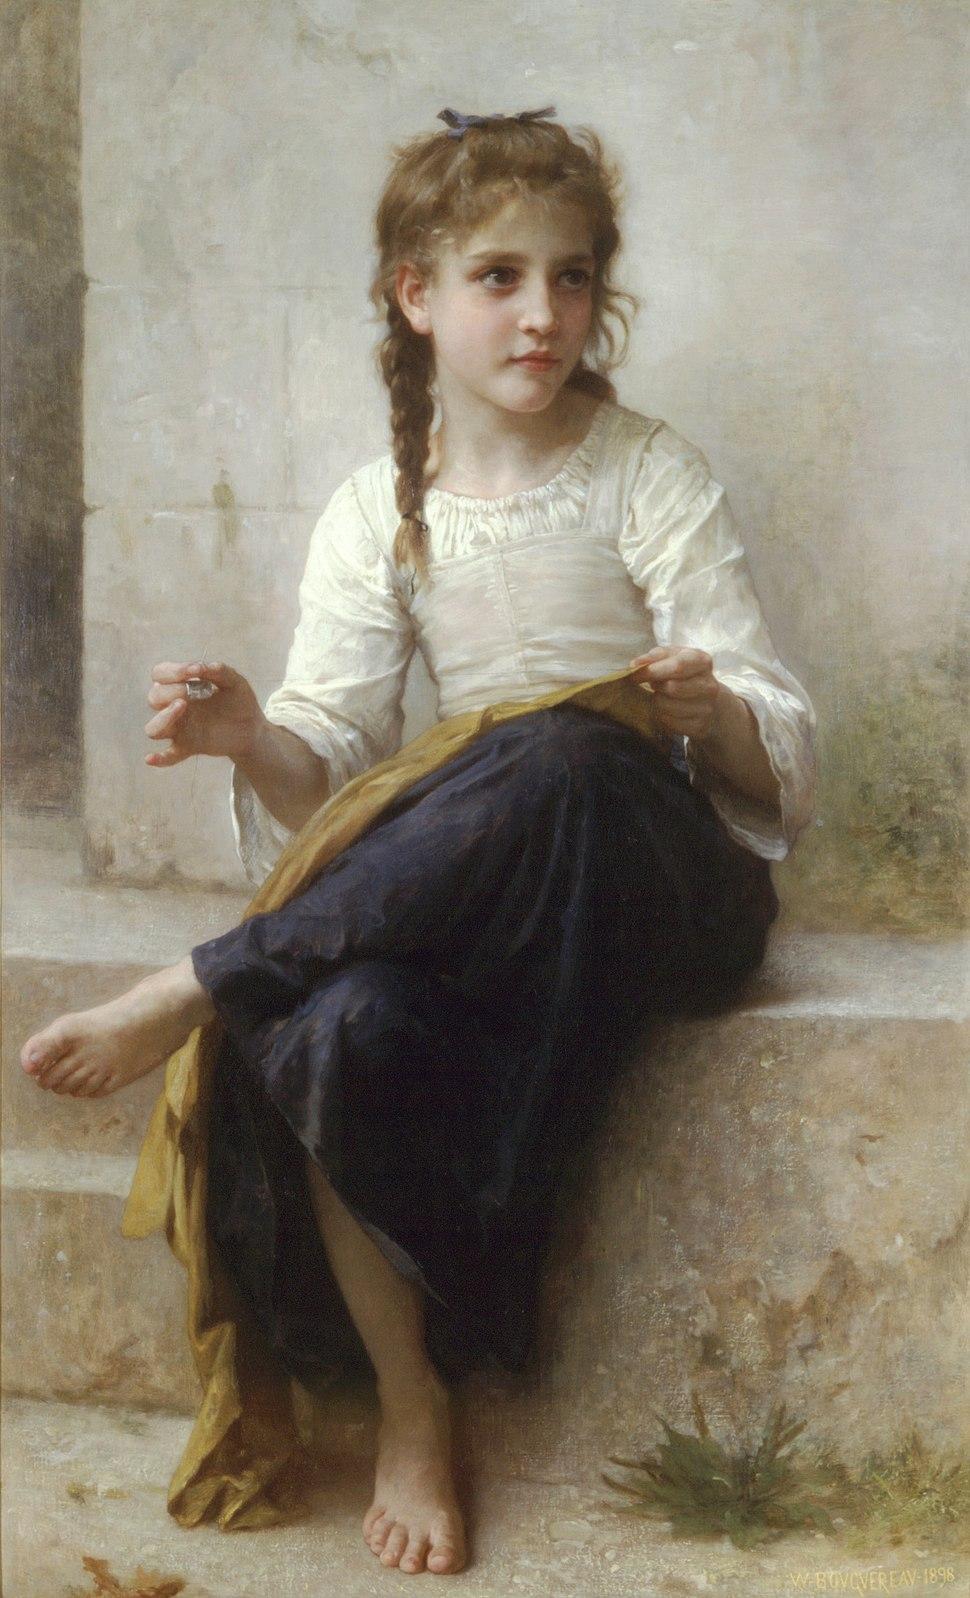 William-Adolphe Bouguereau (1825-1905) - Sewing (1898) Edit 2